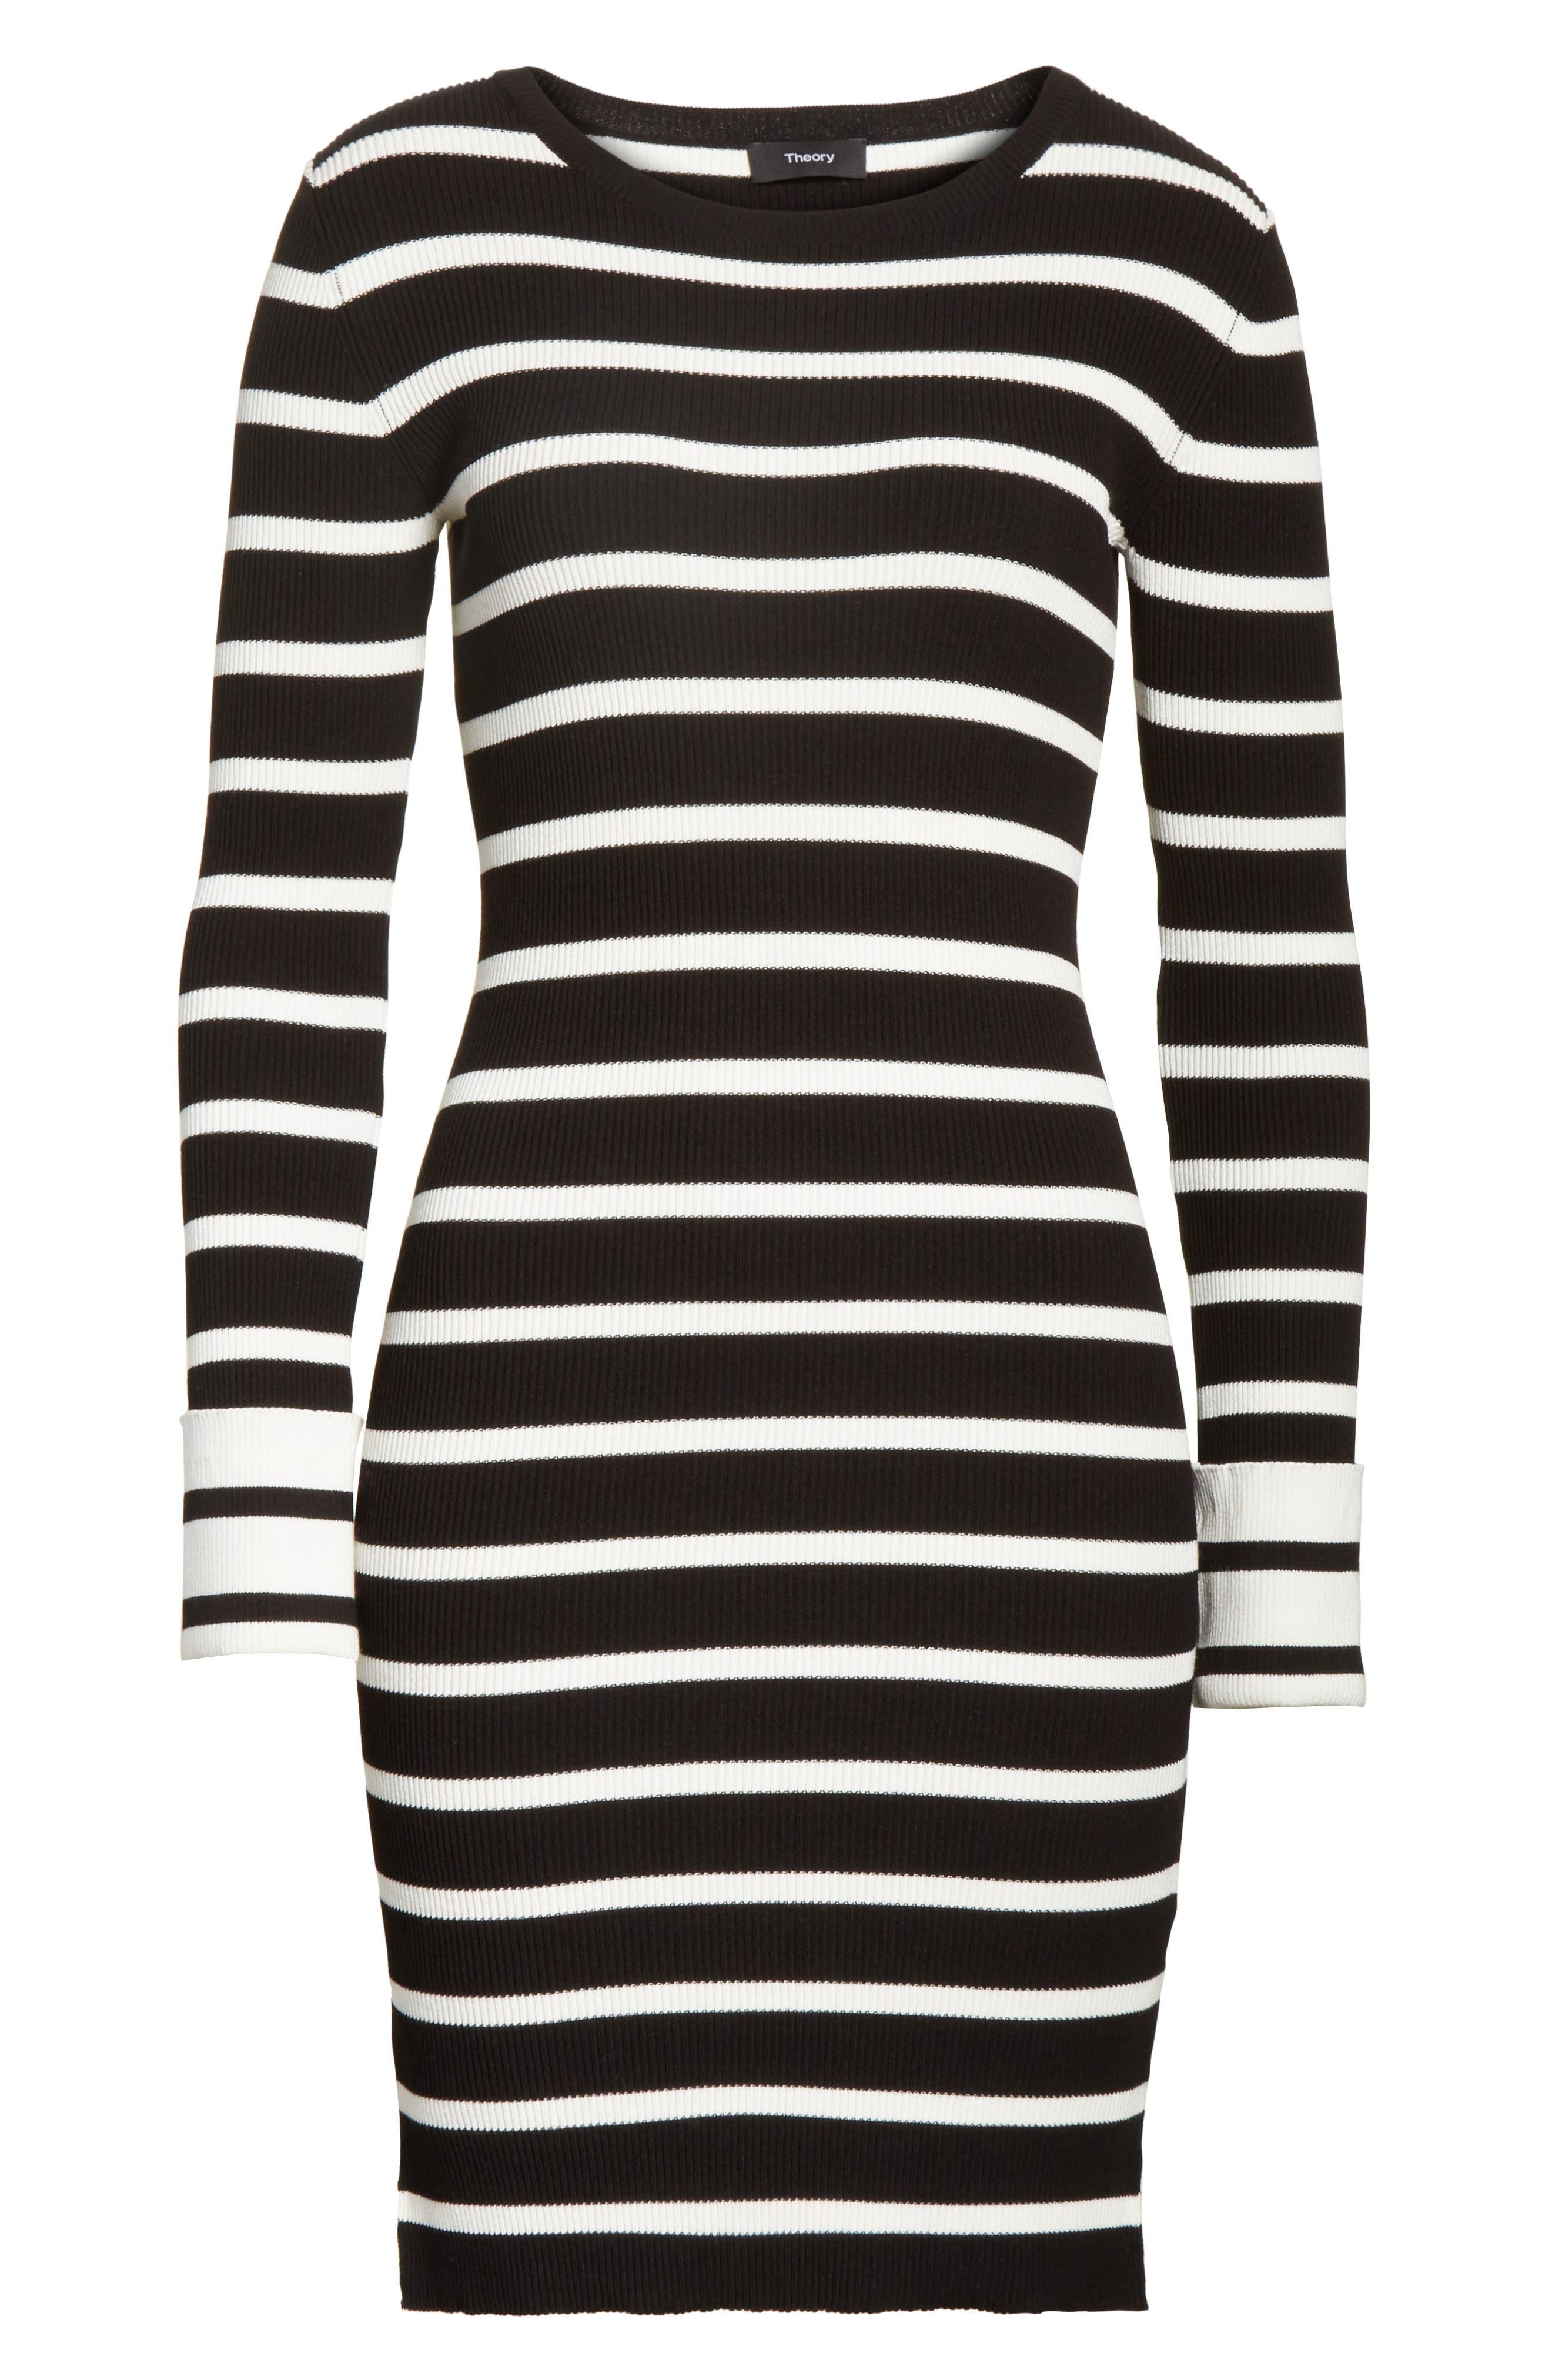 Prosecco Stripe Knit Dress,                             Alternate thumbnail 6, color,                             016